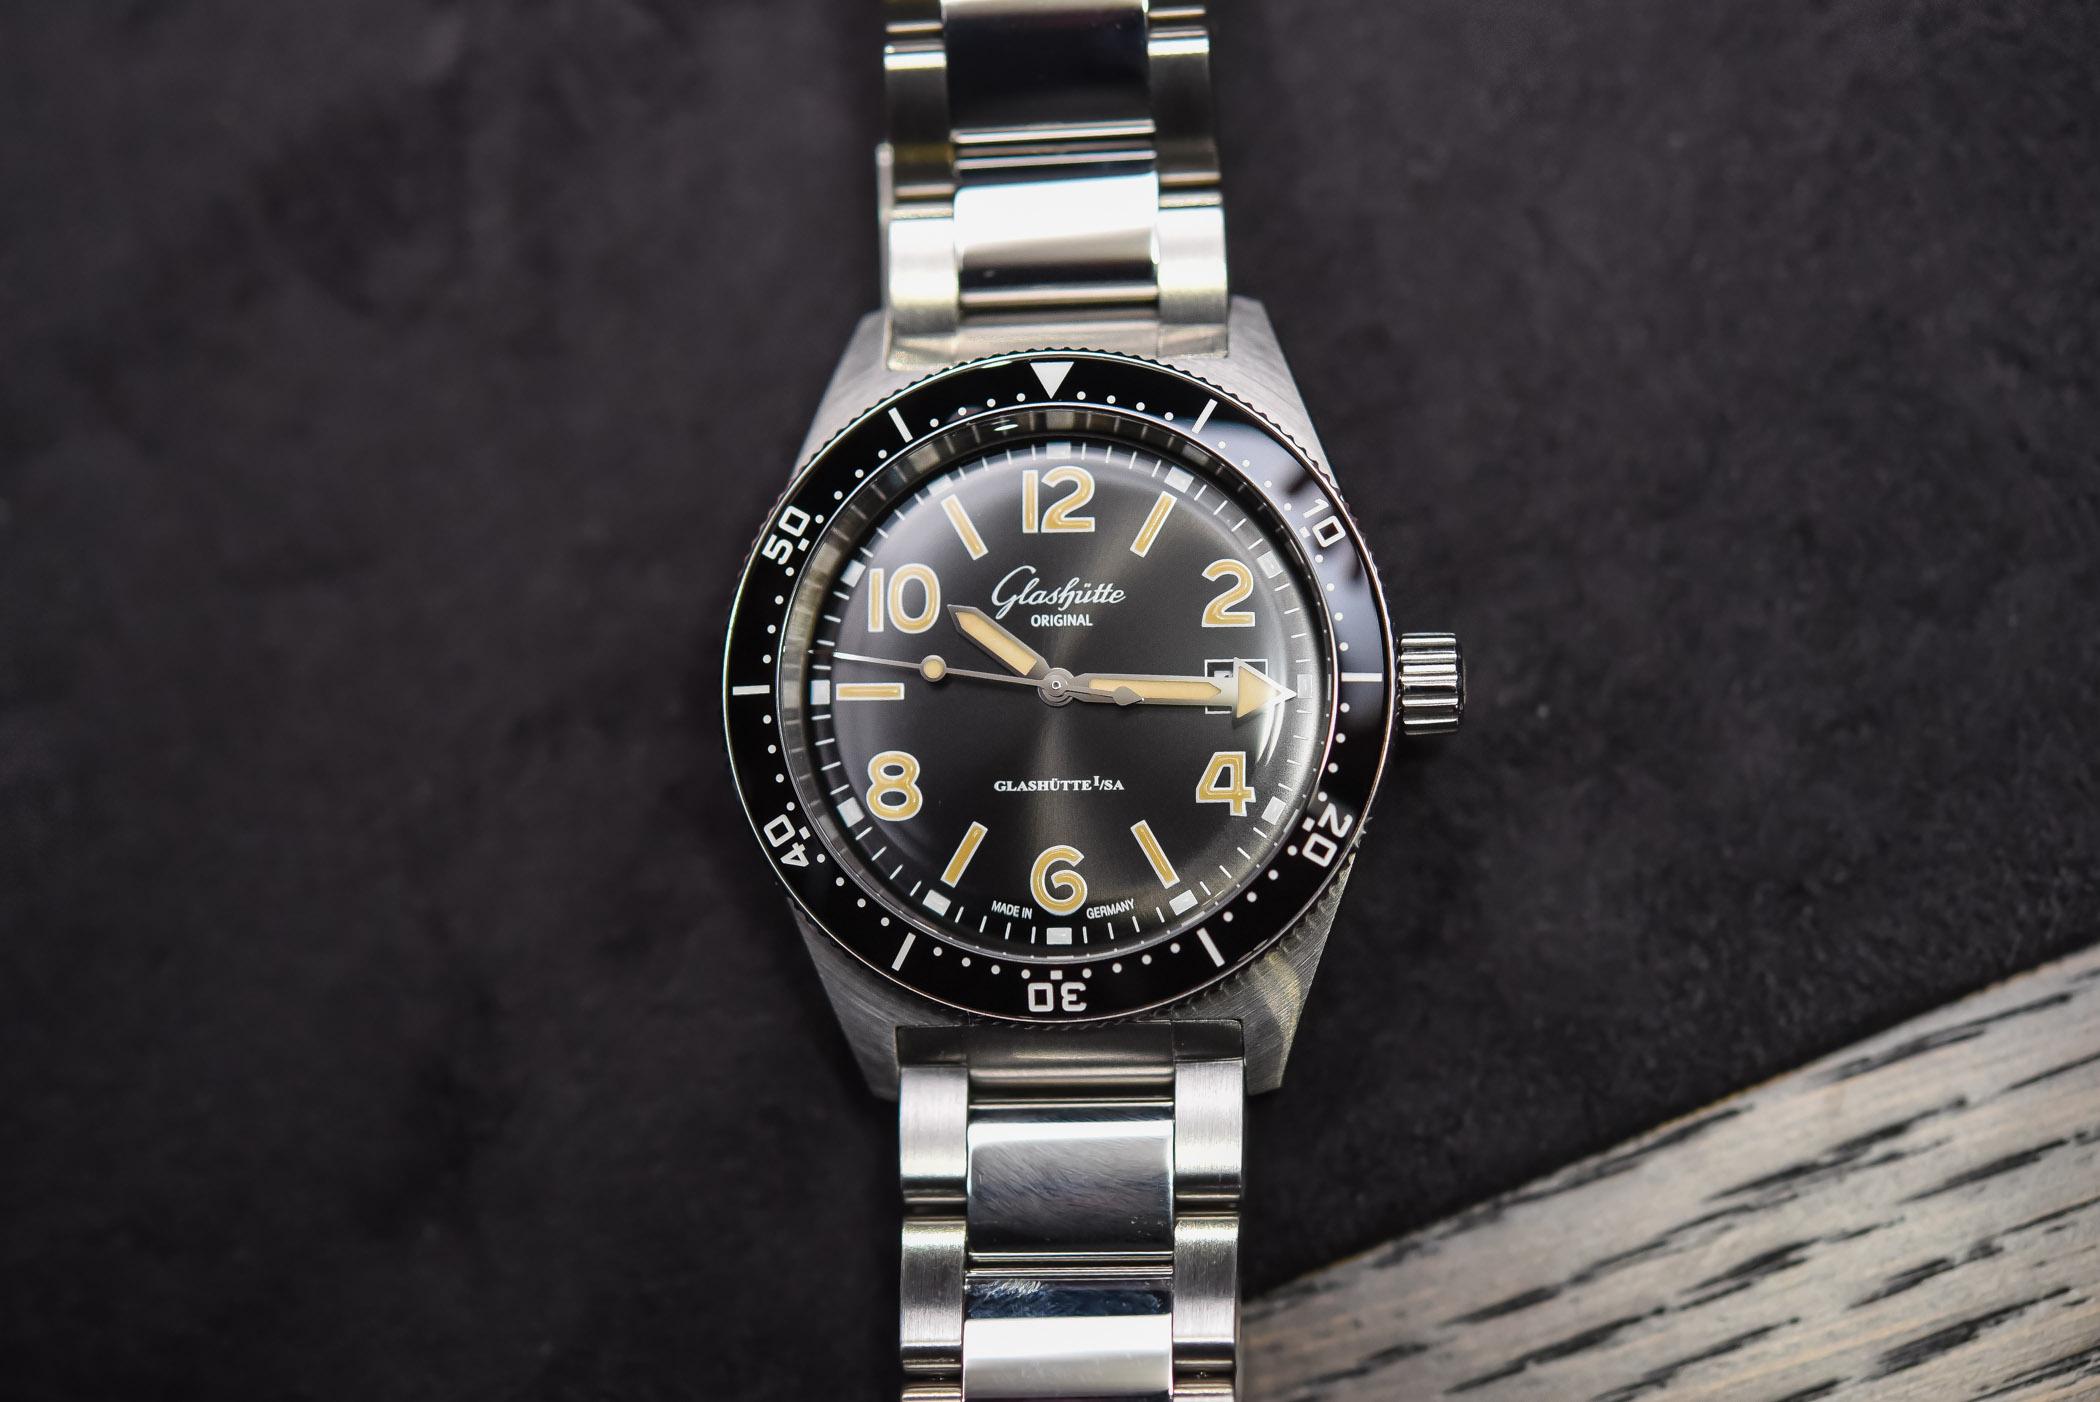 https://k8q7r7a2.stackpathcdn.com/wp-content/uploads/2019/05/Glashutte-Original-SeaQ-Dive-Watch-39.5mm-4.jpg